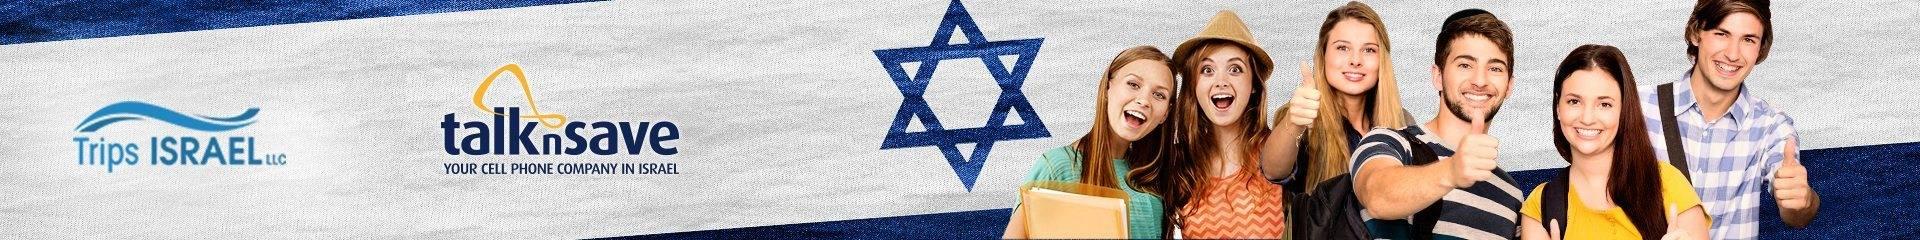 Trips-Israel-Banner